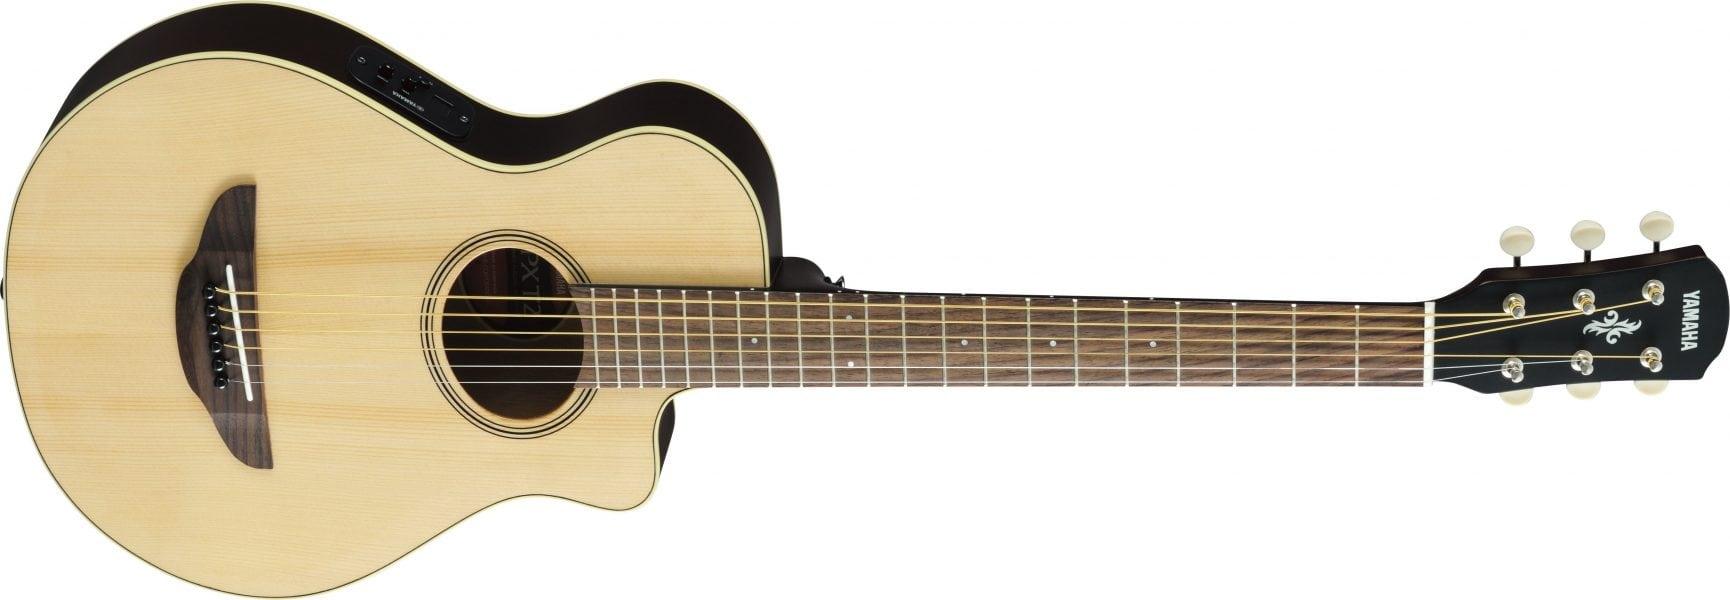 Yamaha APXT2NT 3:4 Acoustic Electric Travel Guitar